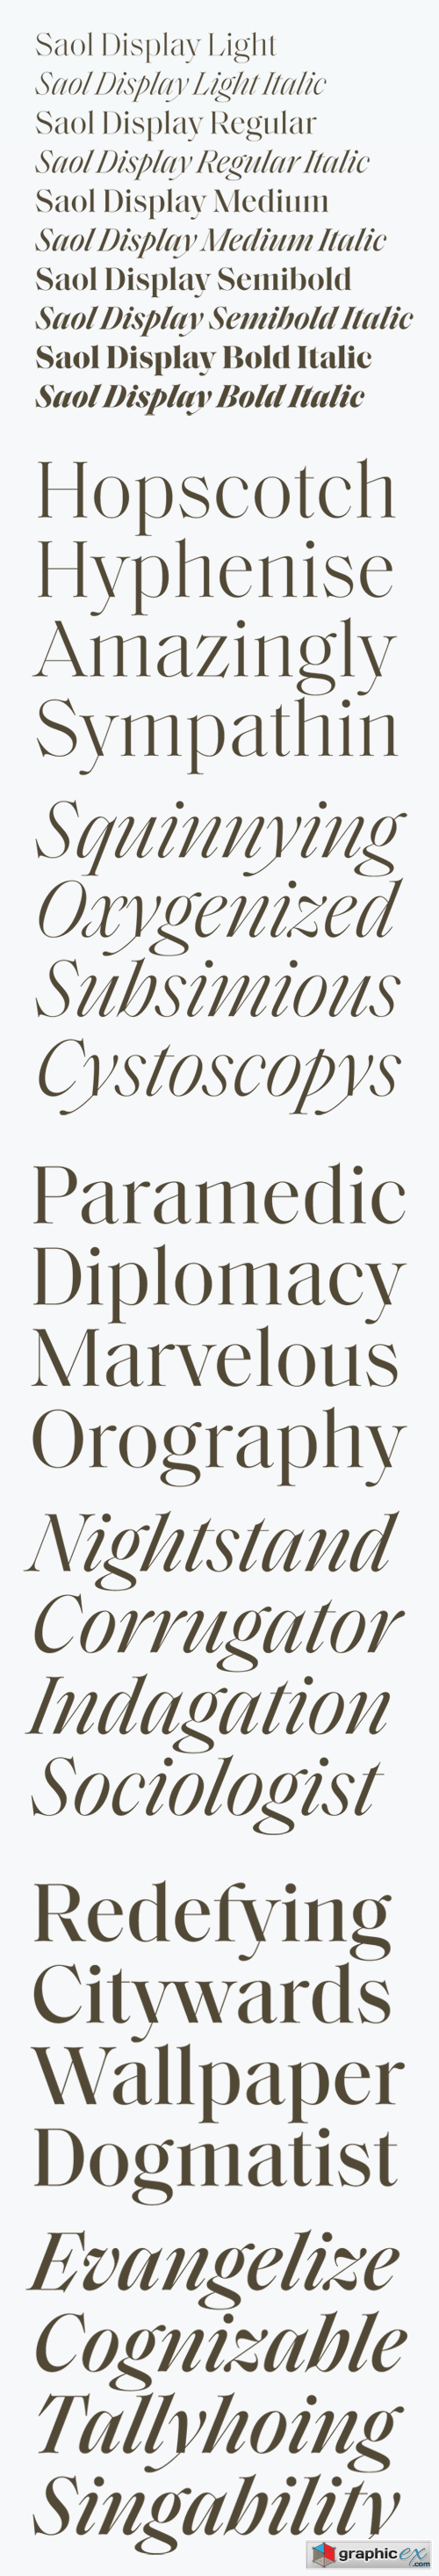 Saol Display Font Family » Free Download Vector Stock Image